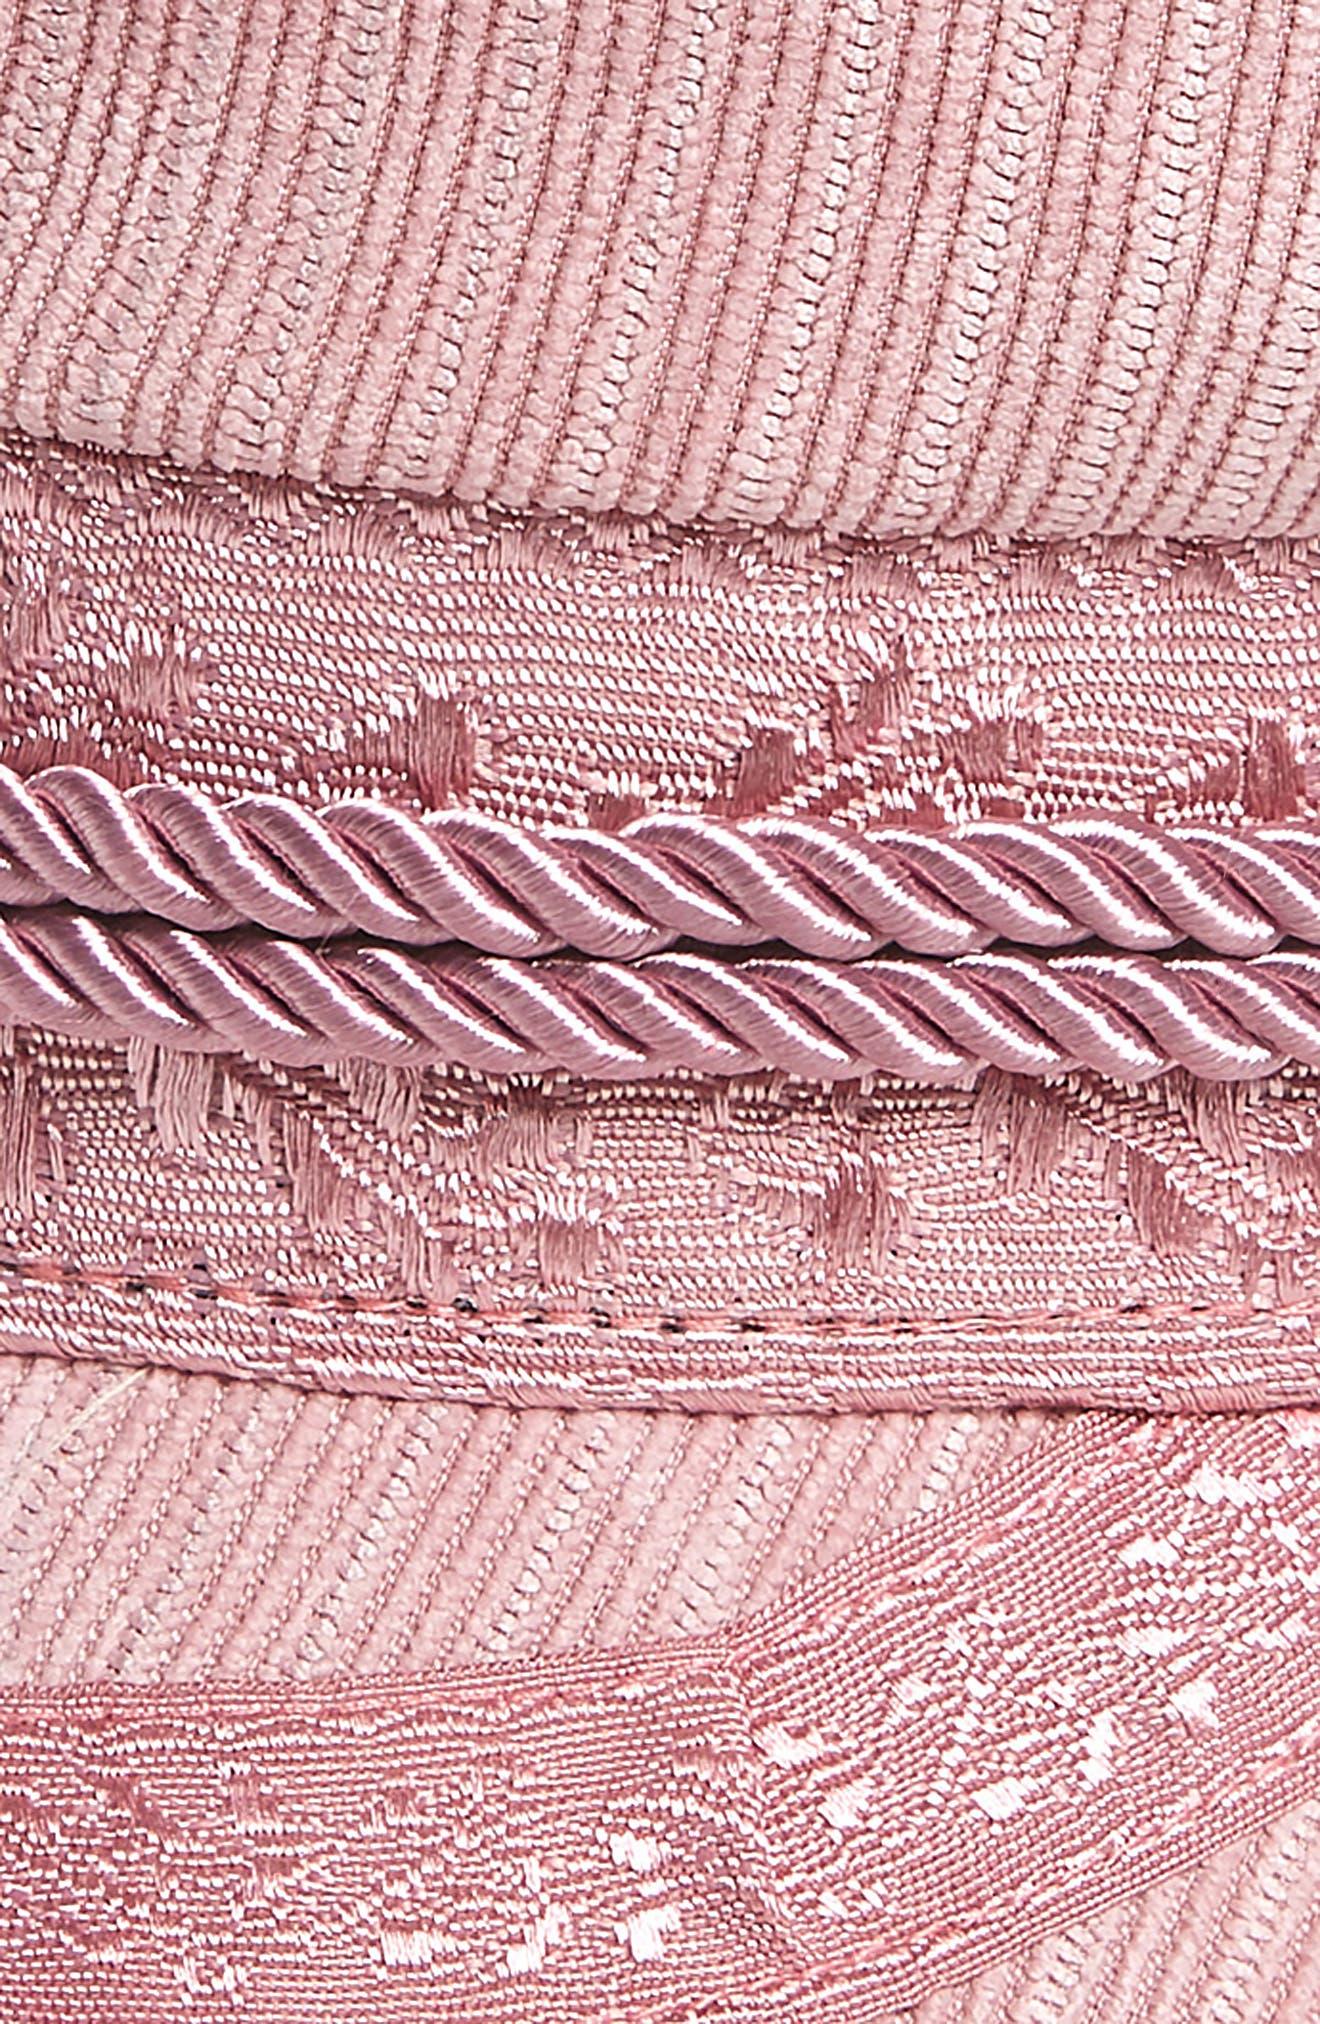 Albany Corduroy Fisherman Cap,                             Alternate thumbnail 2, color,                             LILAC CORD